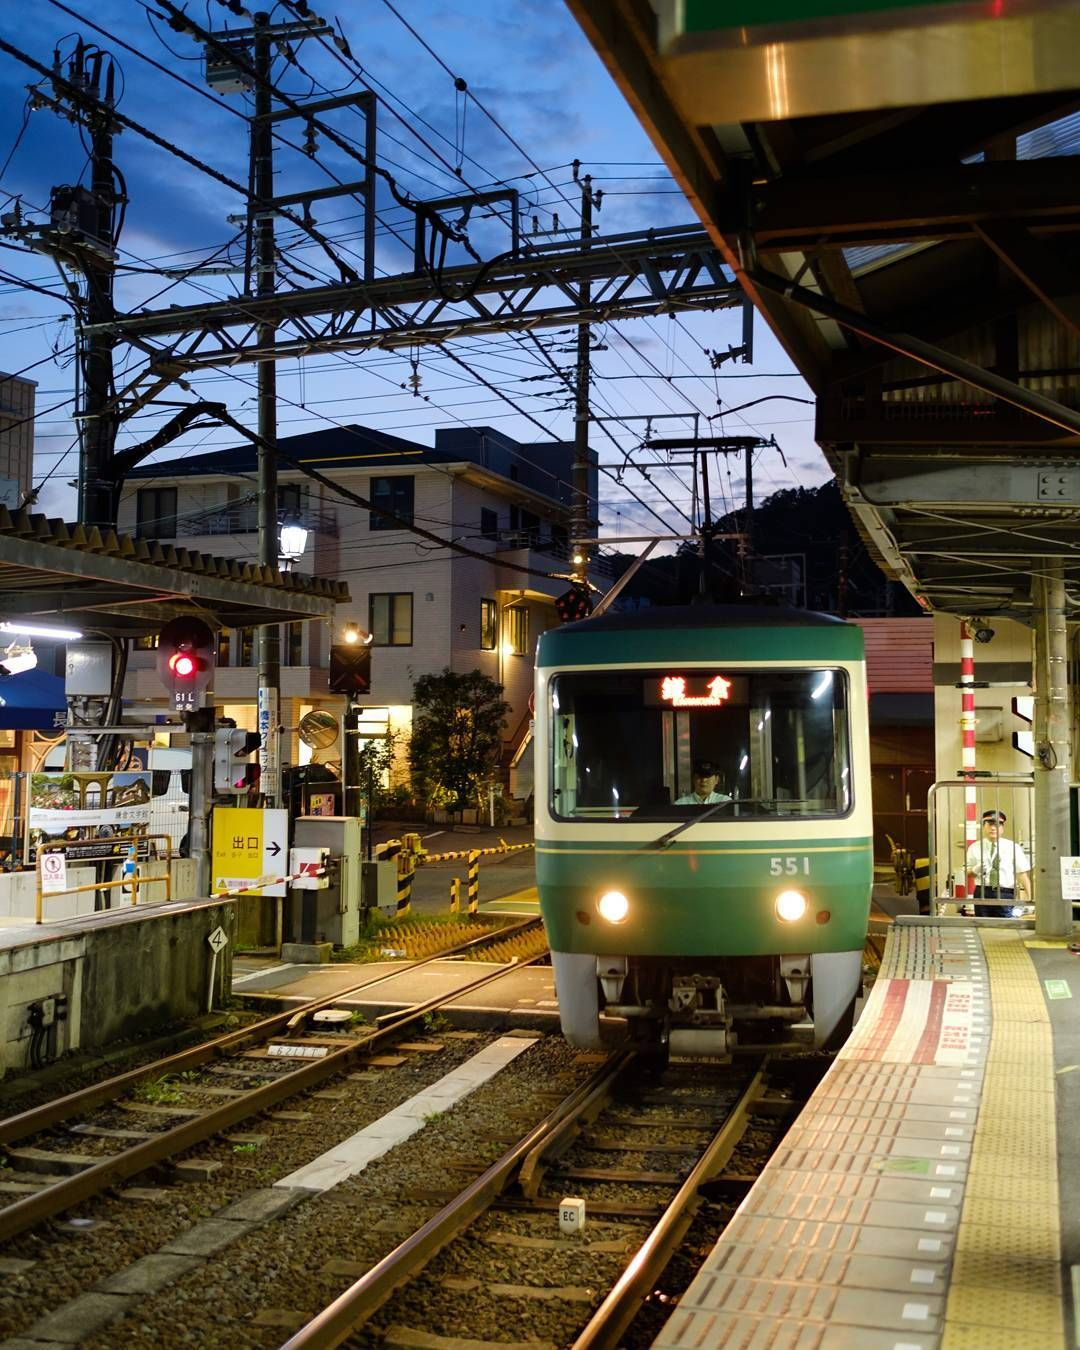 [OC] at Hase Station in Kamakura